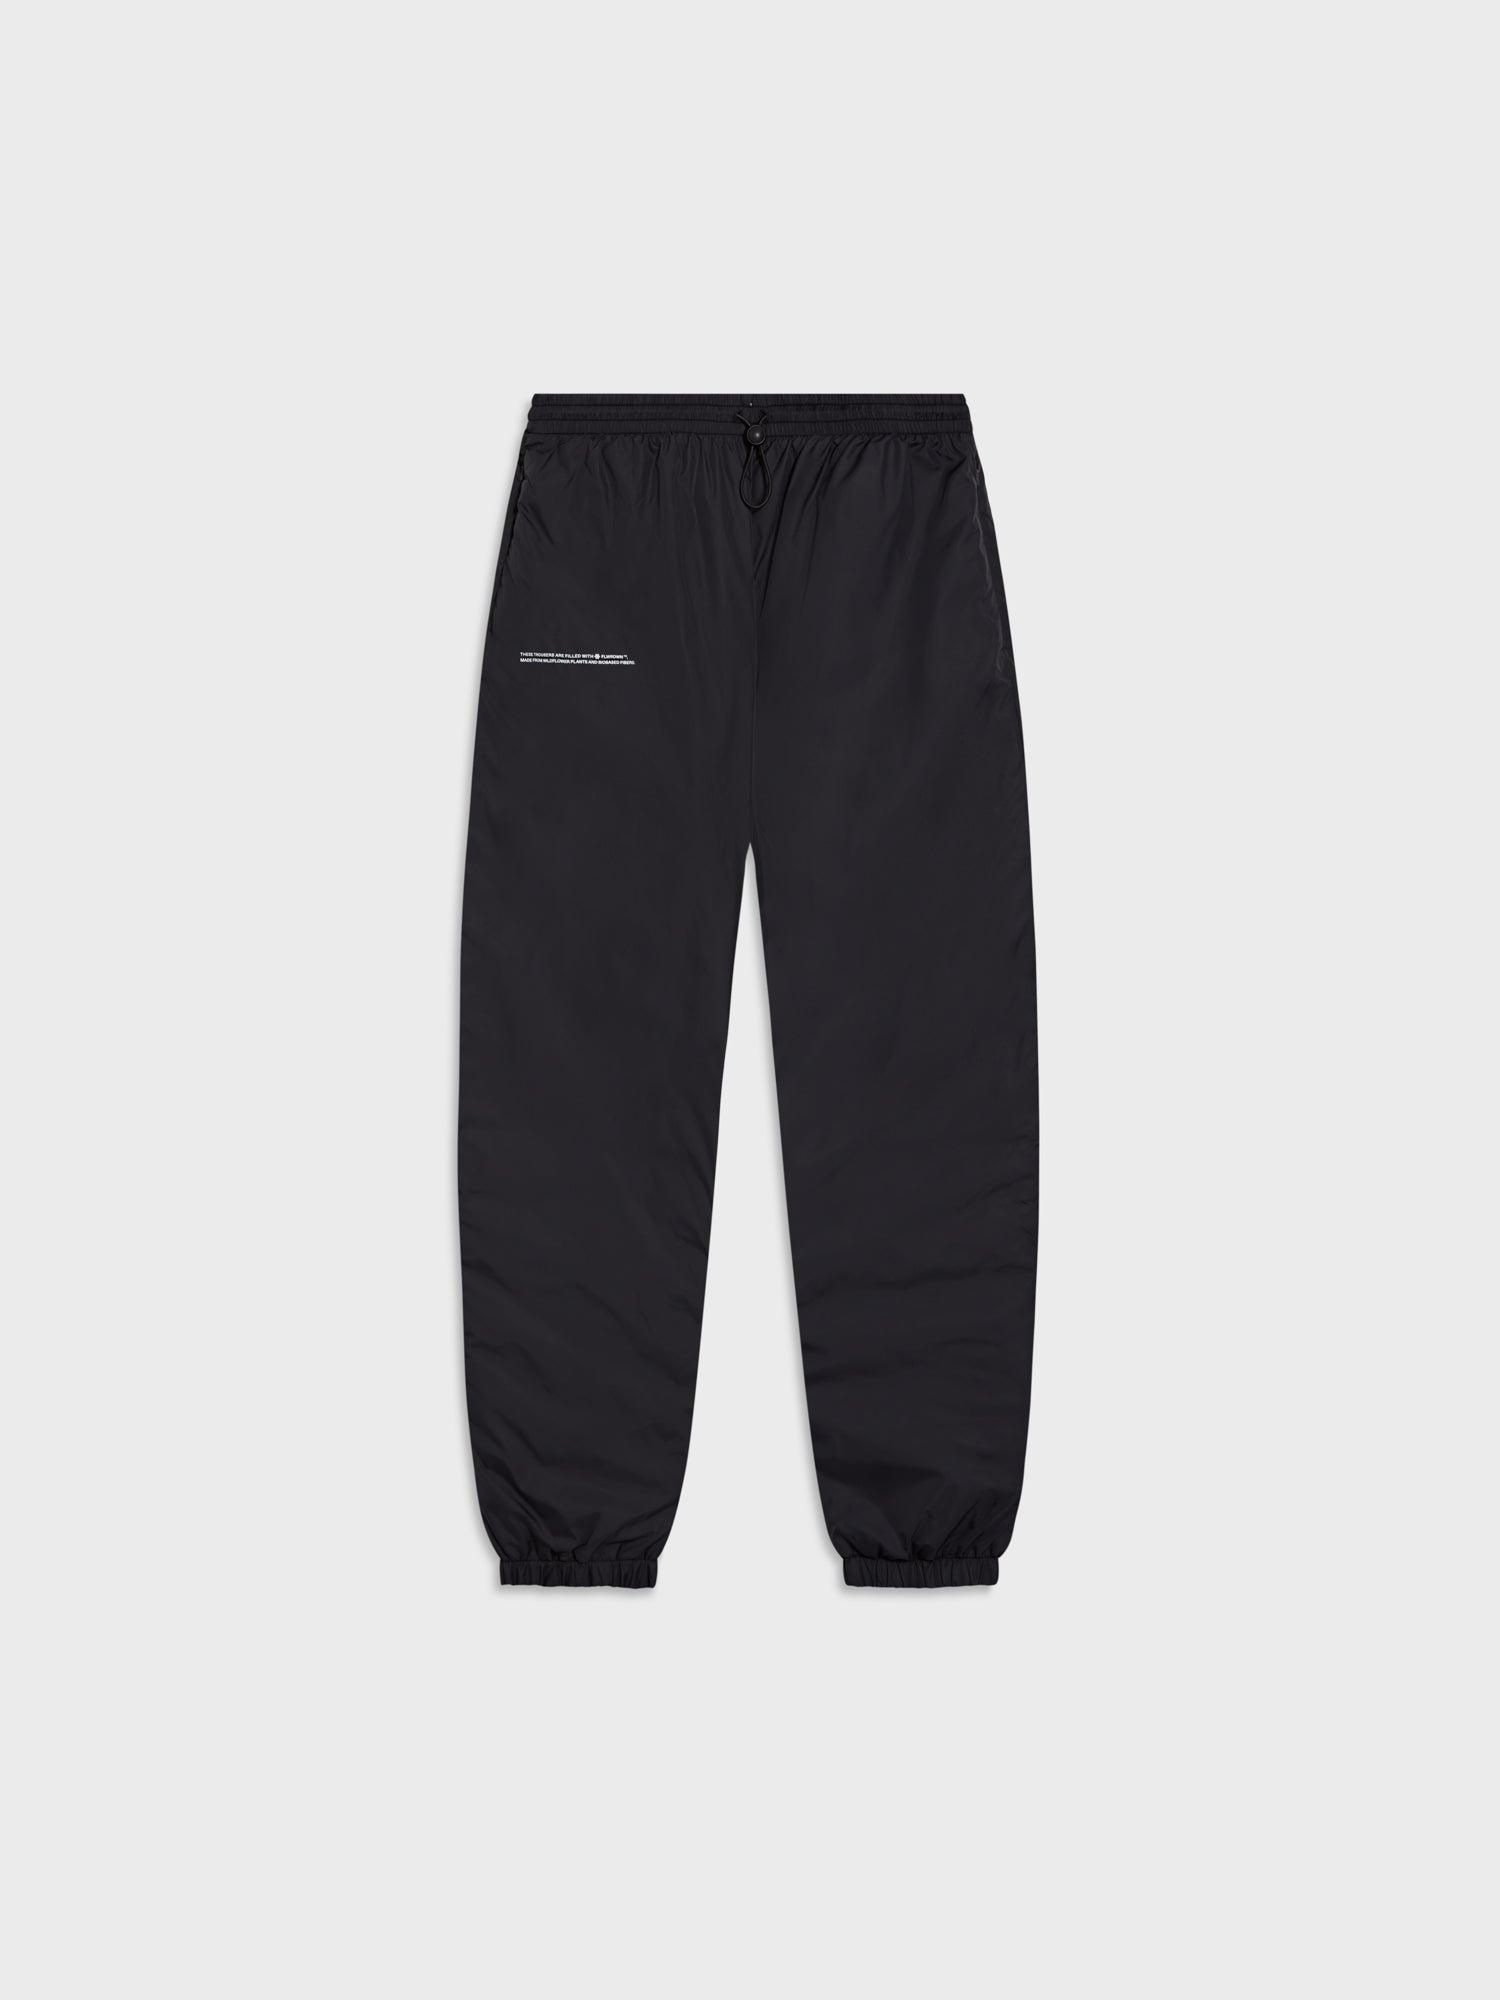 FLWRDWN™ Lite Track Pants